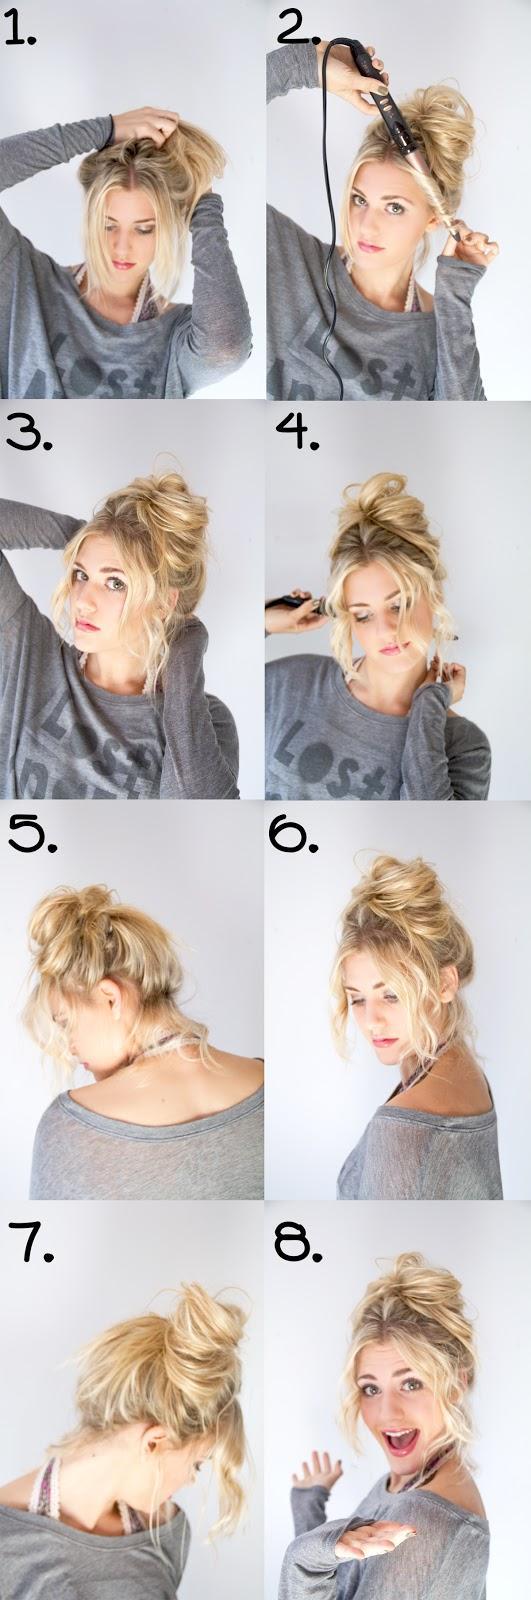 DIY Wedding Hair : DIY Messy Bun | DIY WEDDING | Pinterest | Diy ...